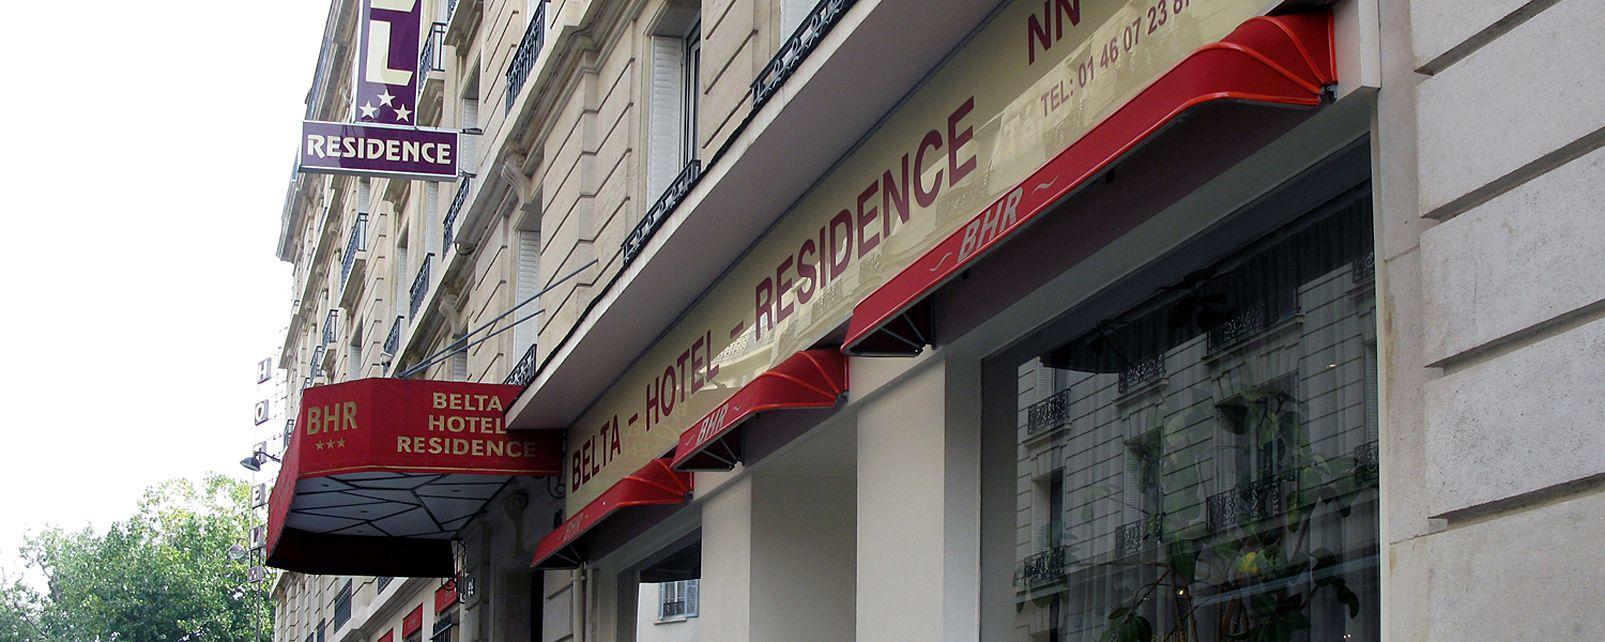 Hotel Belta Paris Bewertung